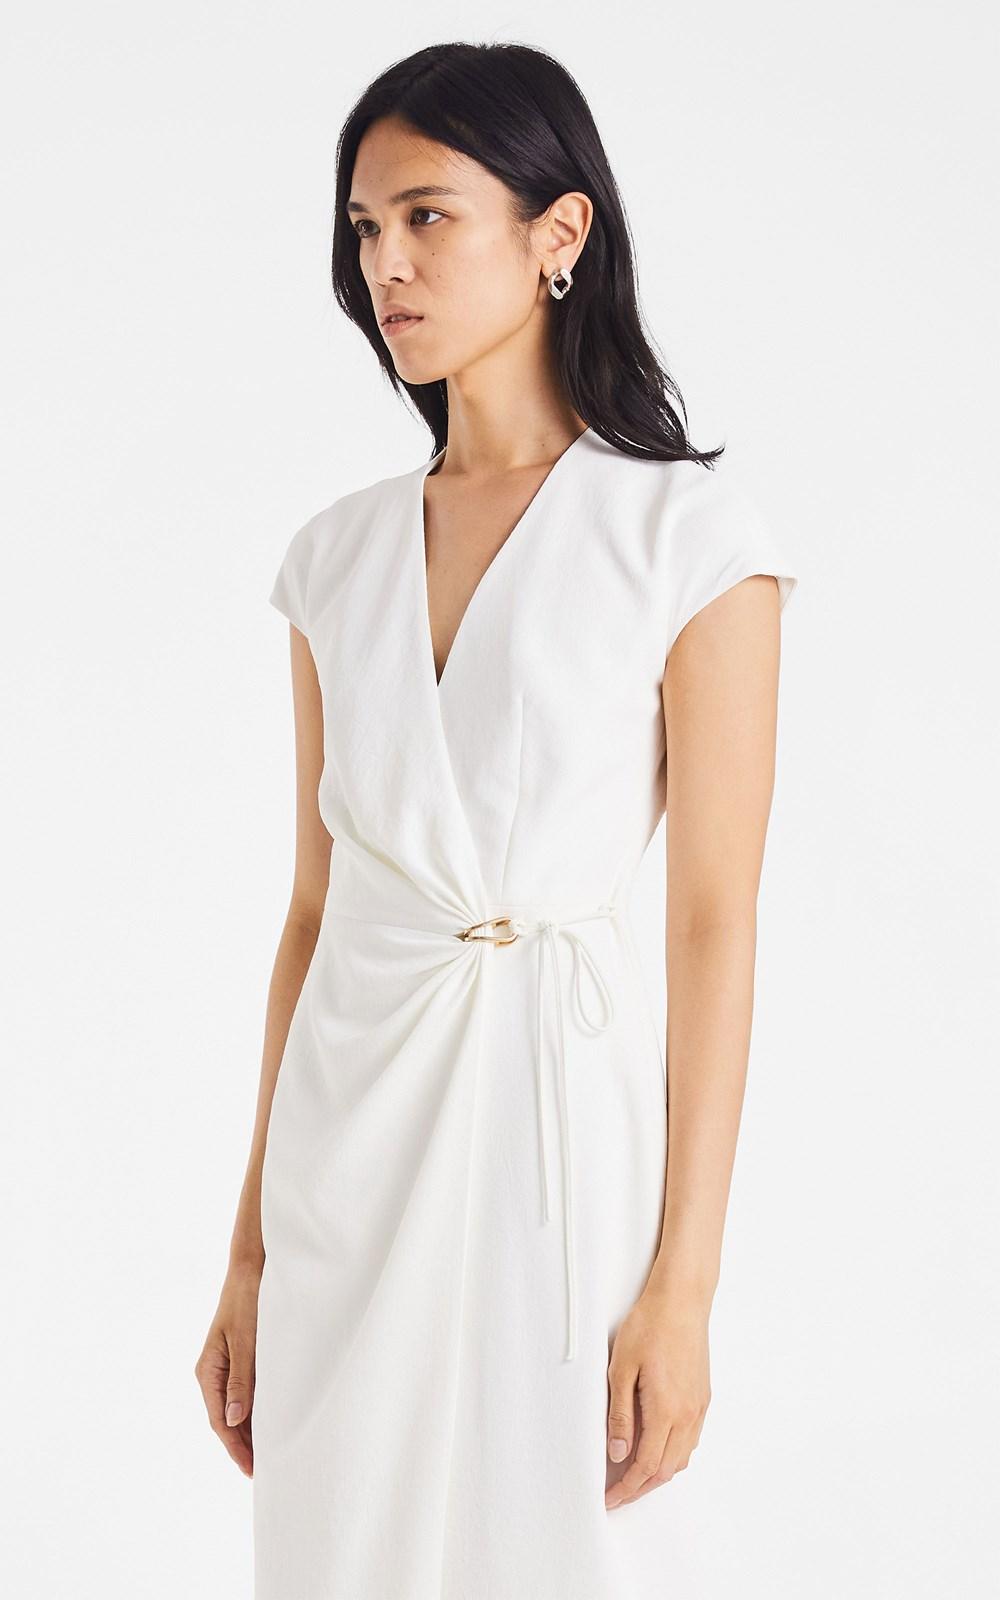 Dresses | WHITEWASH LINK WRAP DRESS